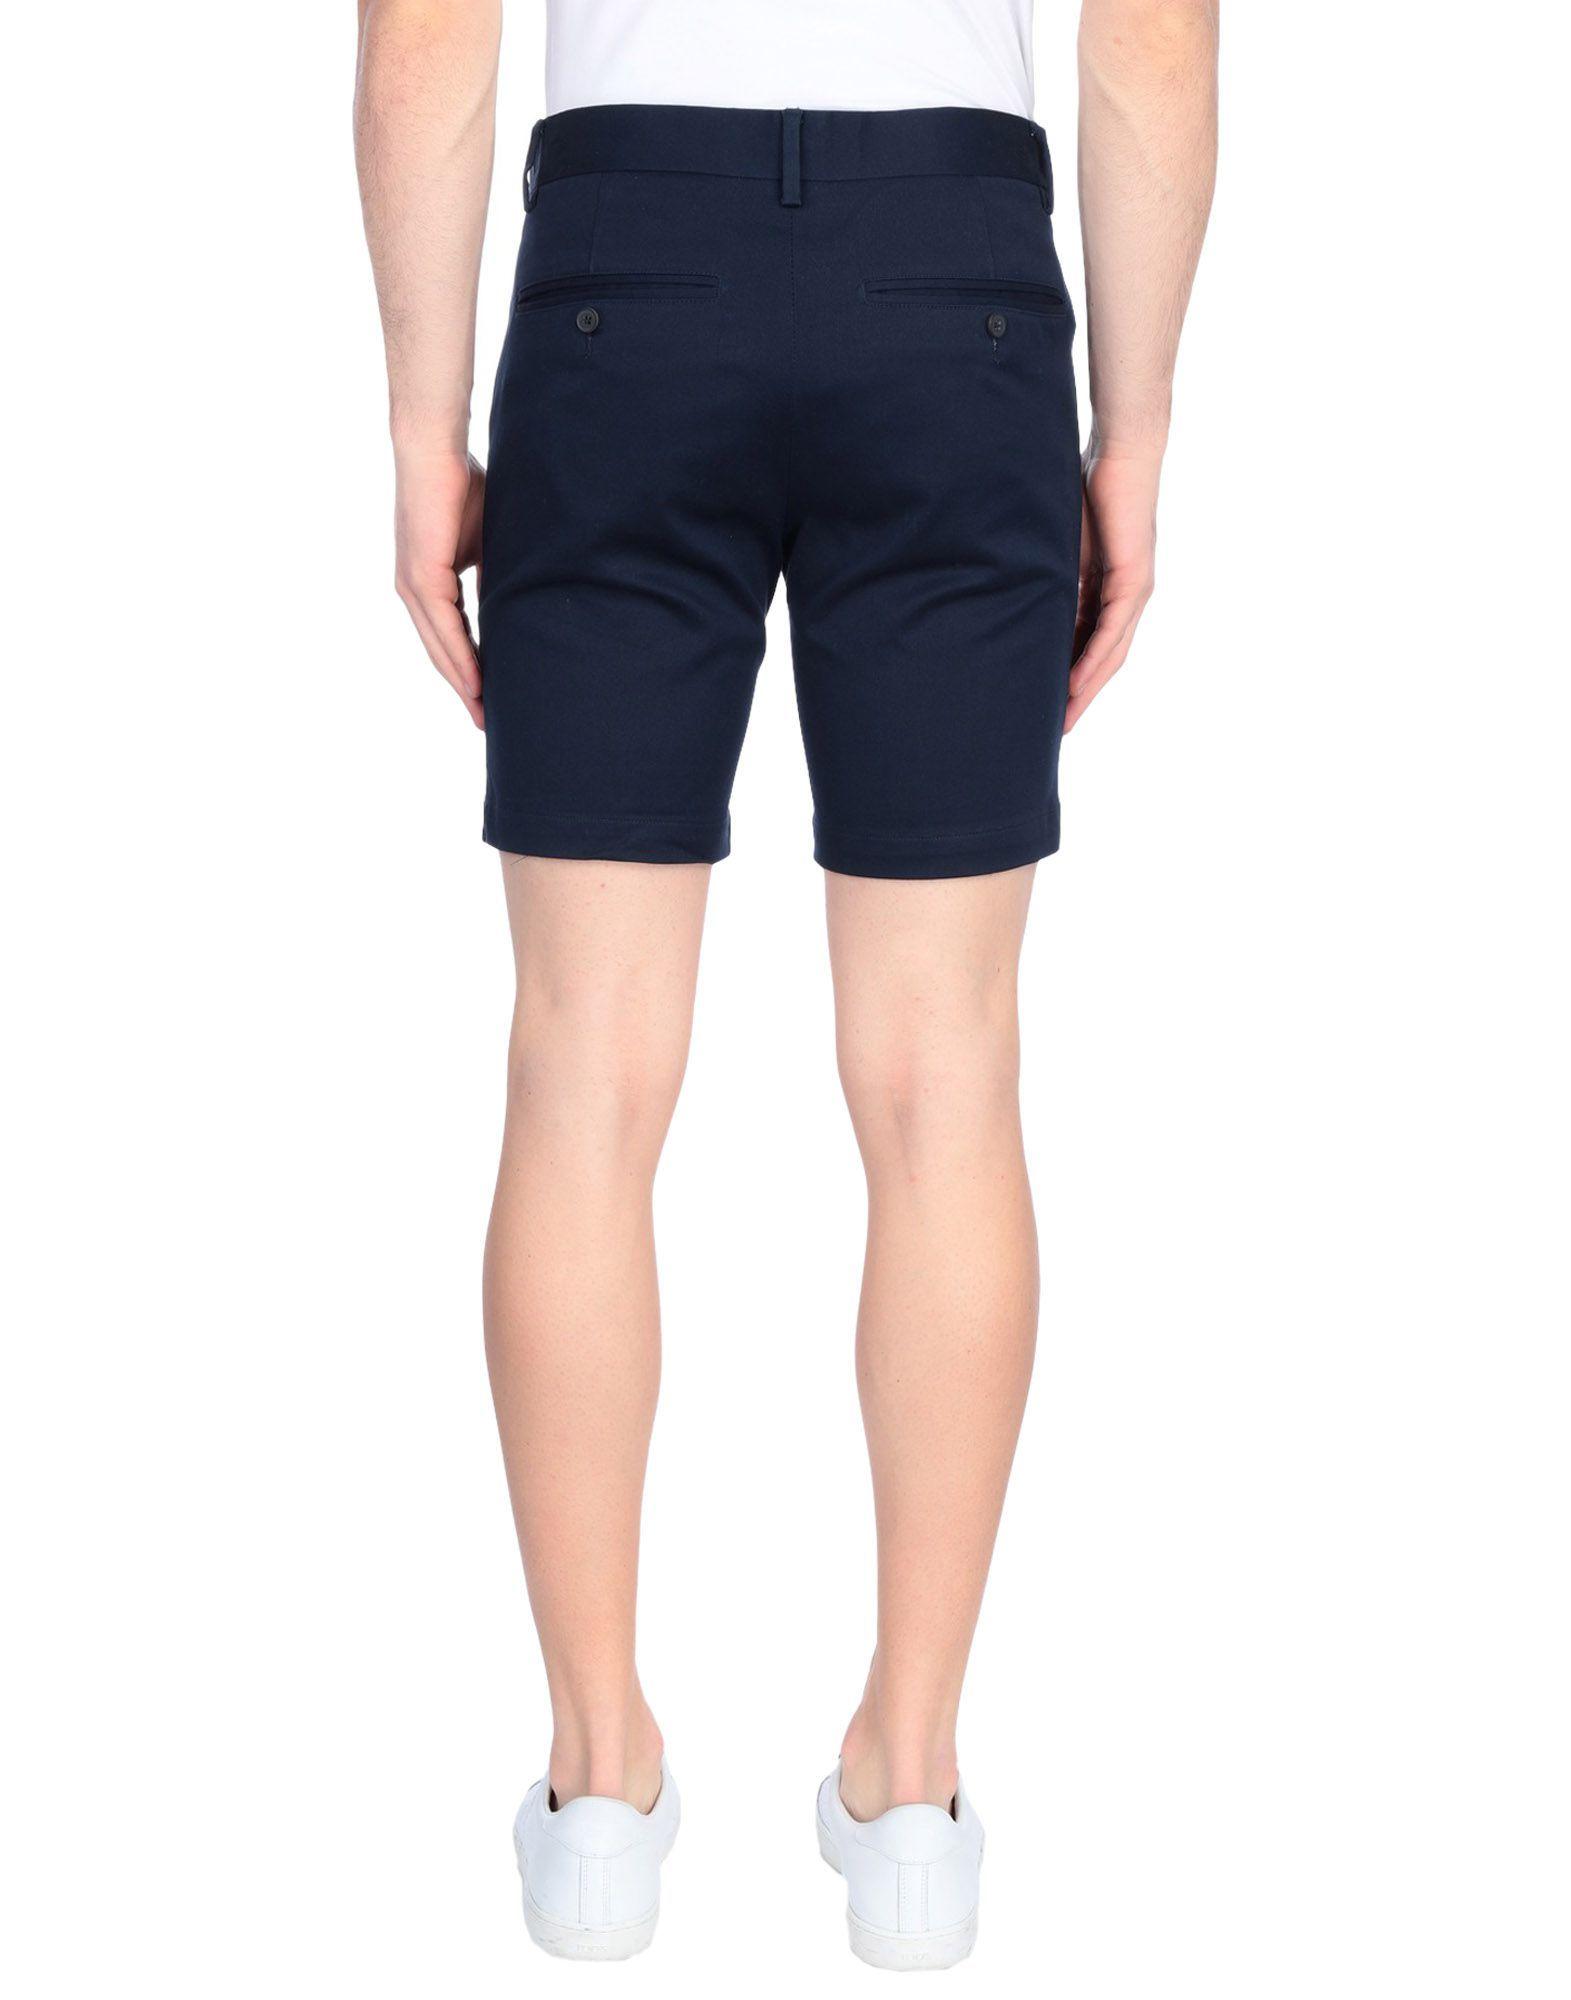 Minimum Dark Blue Cotton Shorts